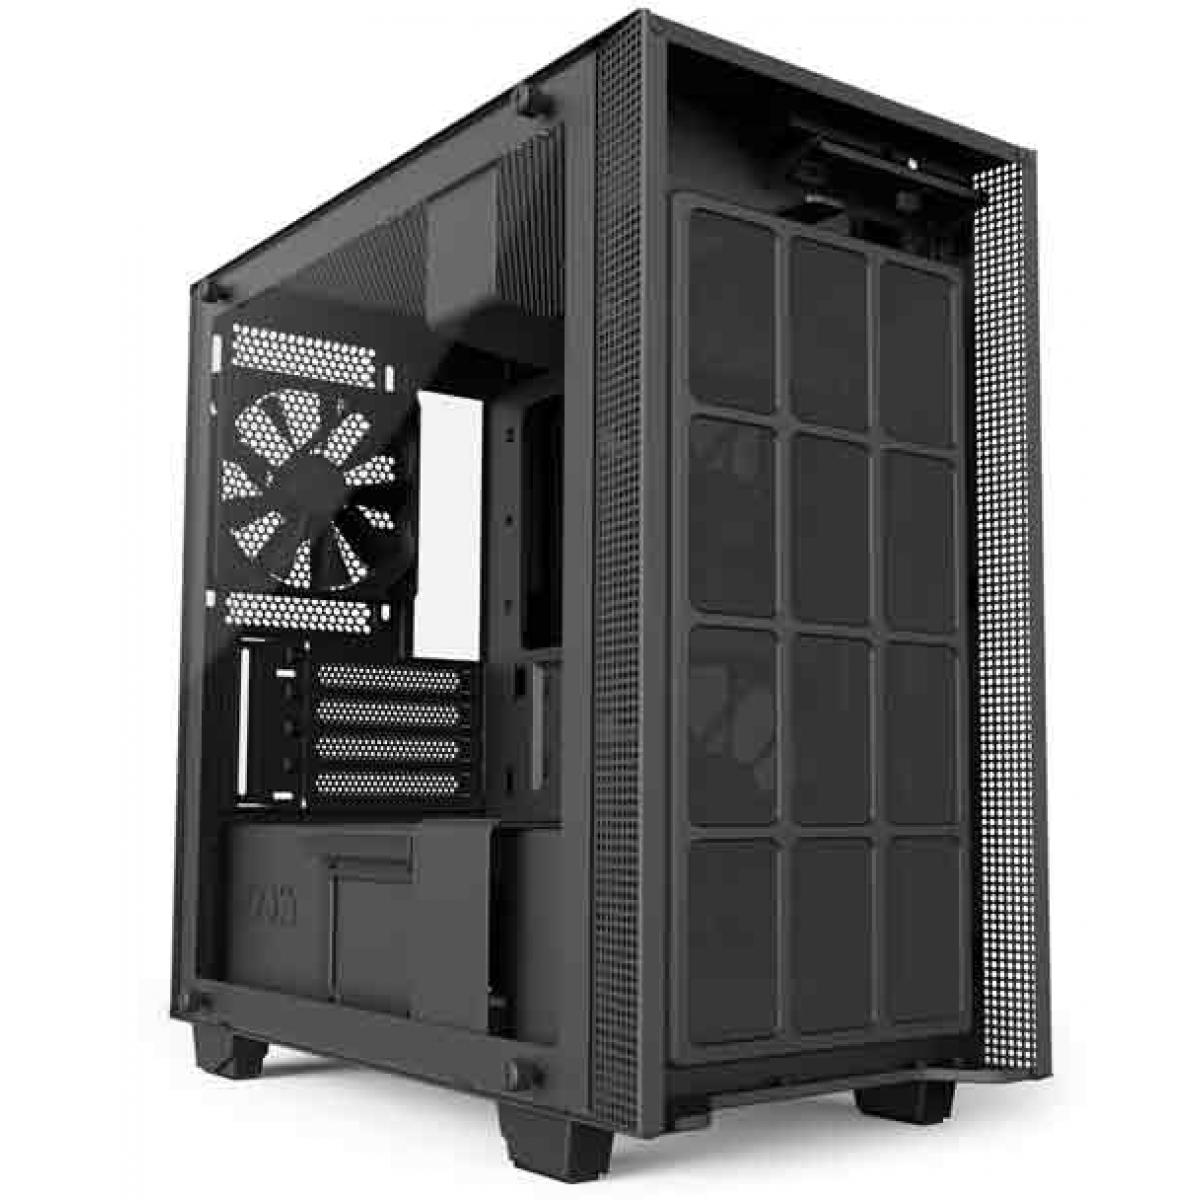 Gabinete Gamer NZXT H400I, Mid Tower, Com 3 Fans, Vidro Temperado, Black, Sem Fonte, CA-H400W-BB